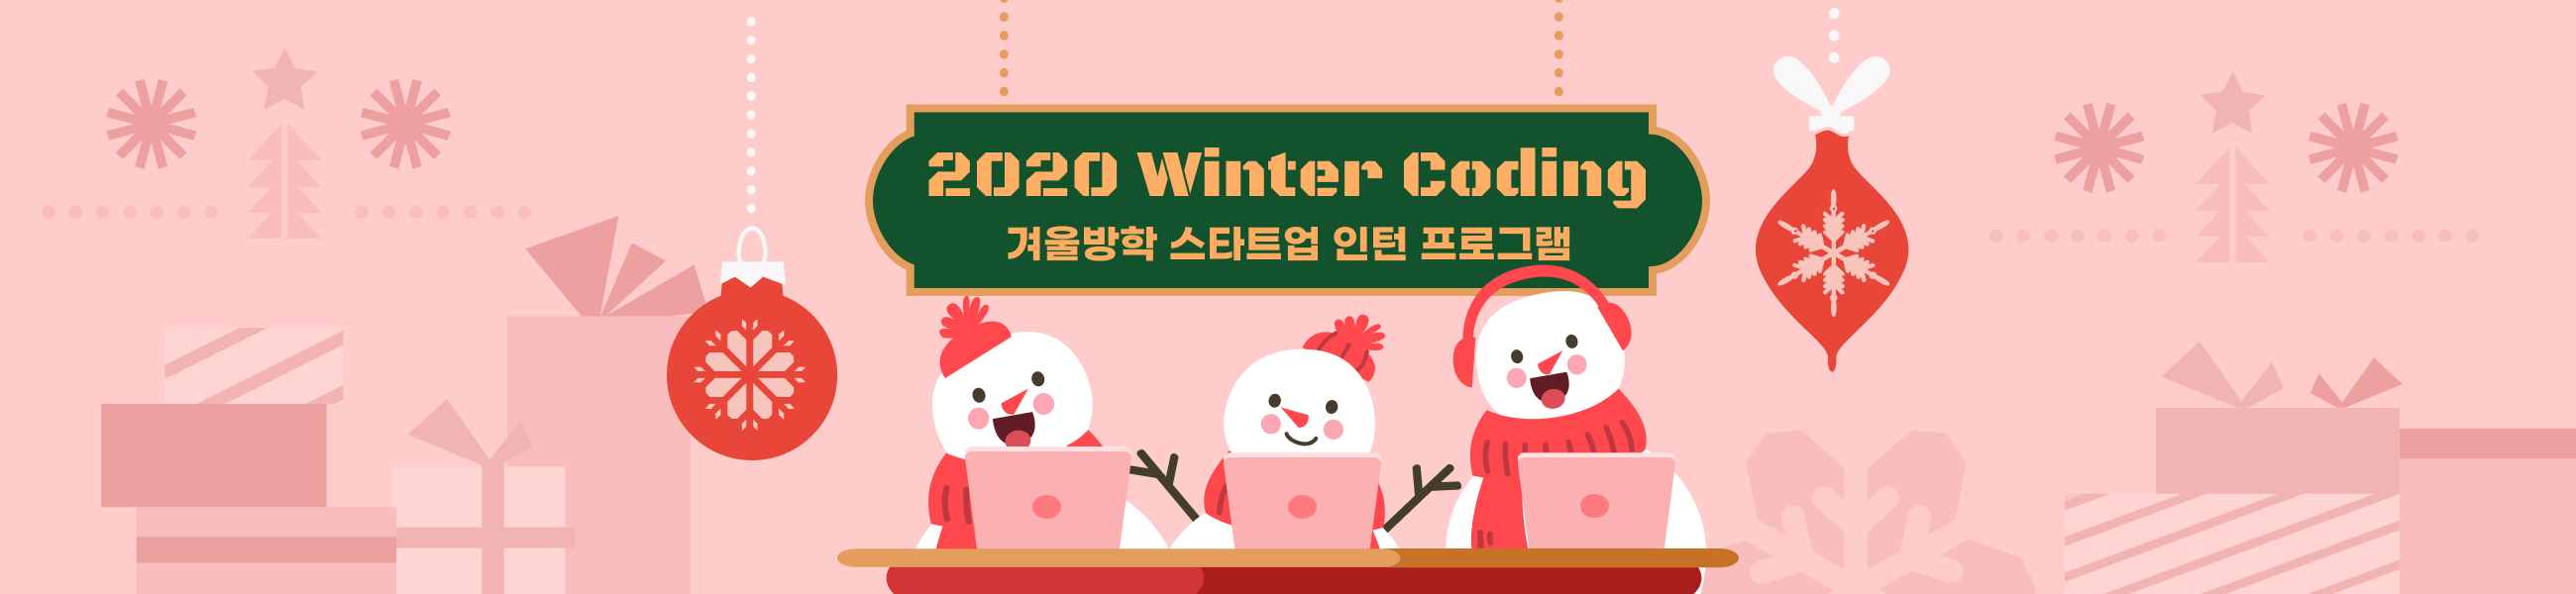 2020 Winter Coding - 겨울방학 스타트업 인턴 프로그램의 이미지